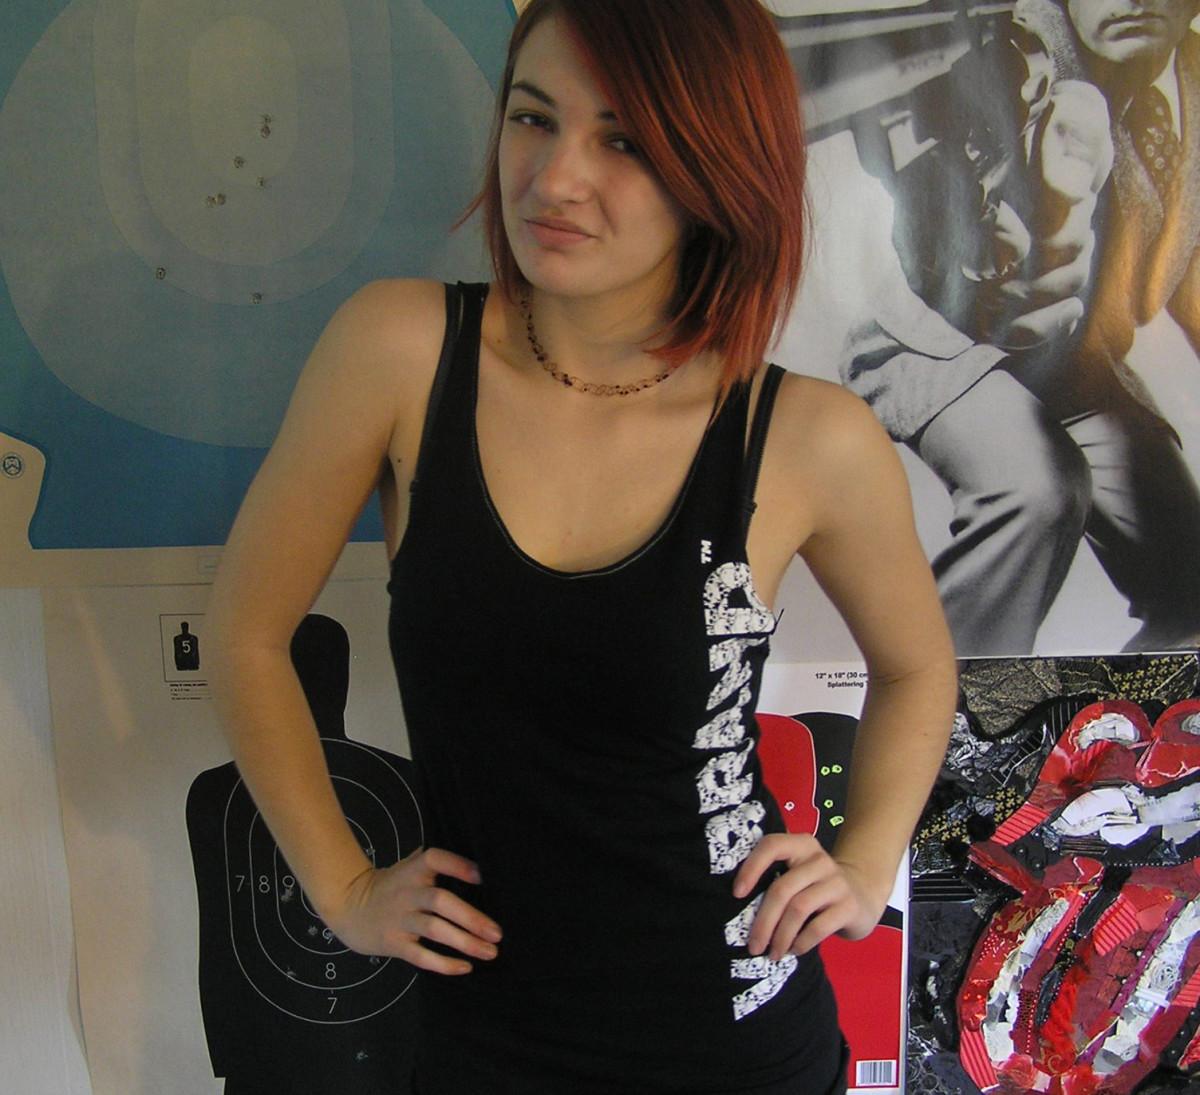 diy-fashion-make-a-t-shirt-into-a-tank-top